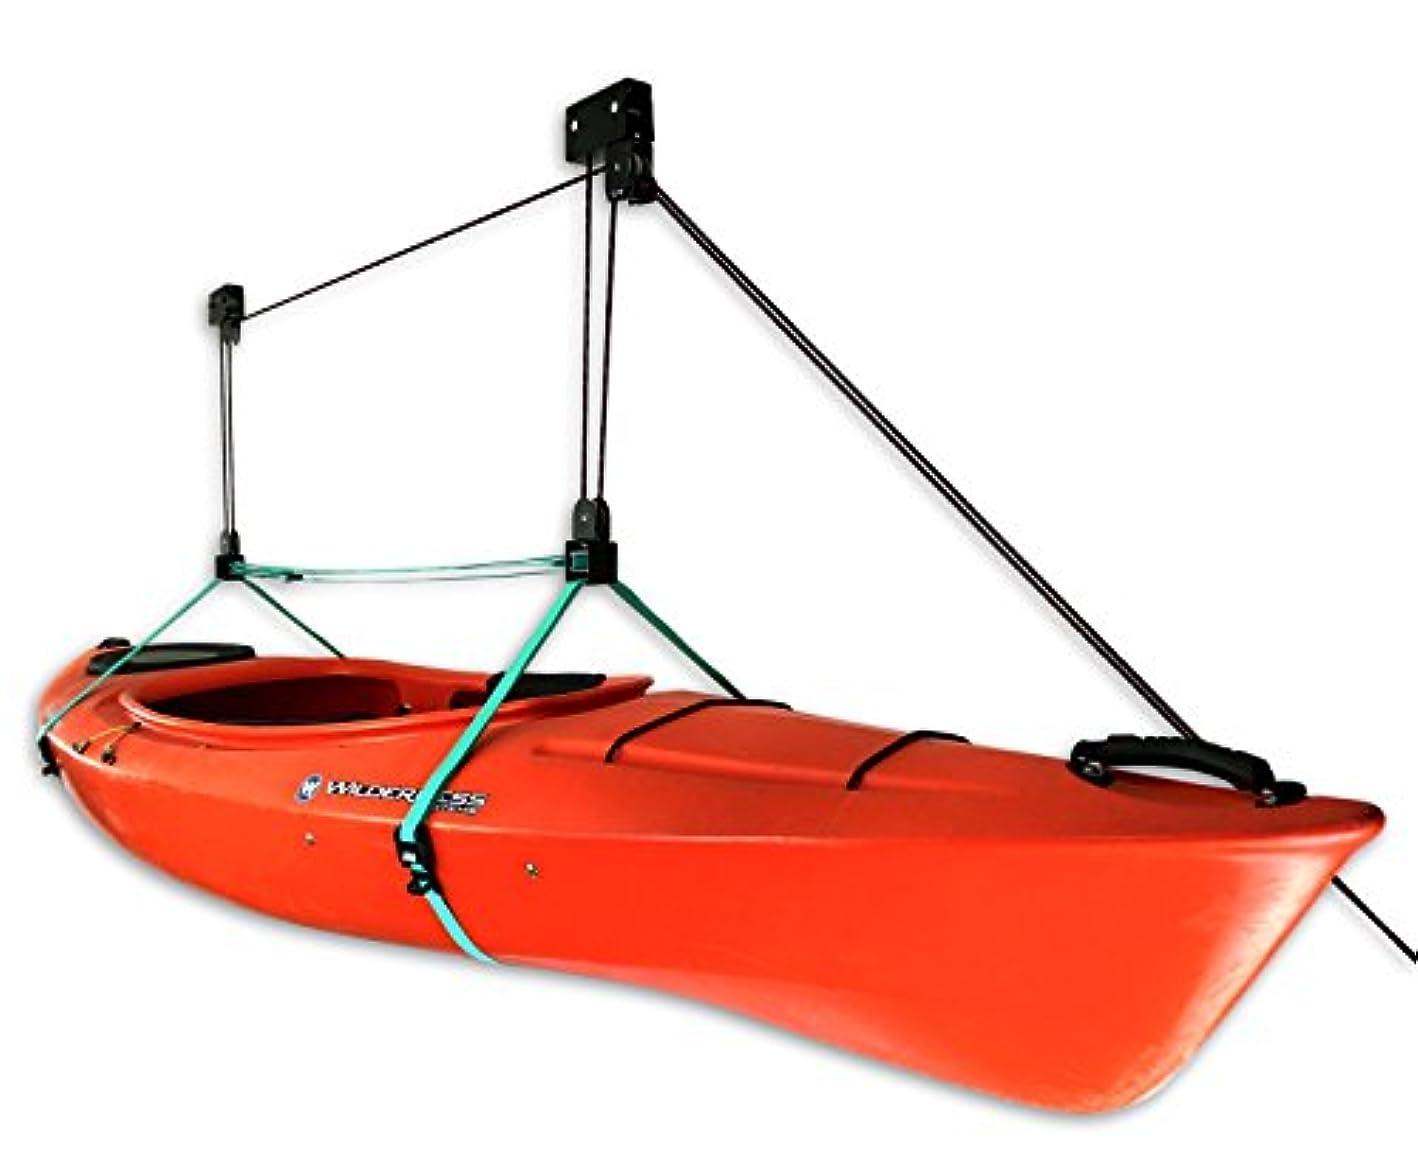 StoreYourBoard Kayak Ceiling Storage Hoist   Hi-Lift Home & Garage Hanging Pulley Rack